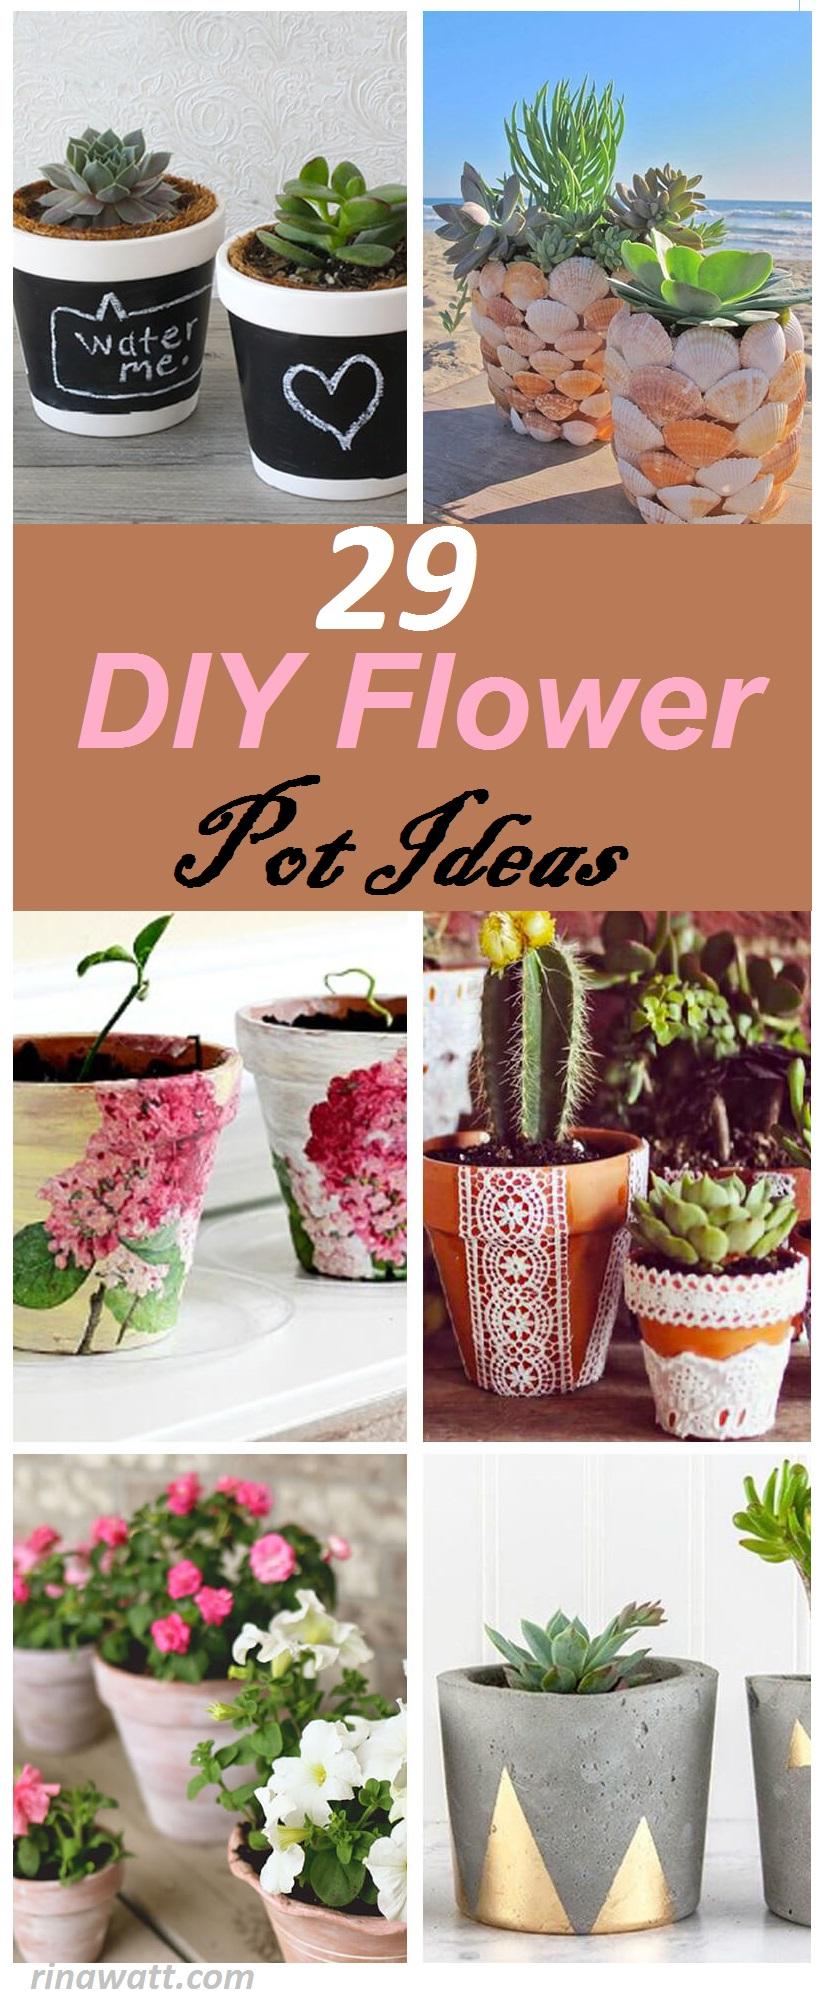 29 Fresh As A Daisy Diy Flower Pot Ideas For Stylish Gardeners